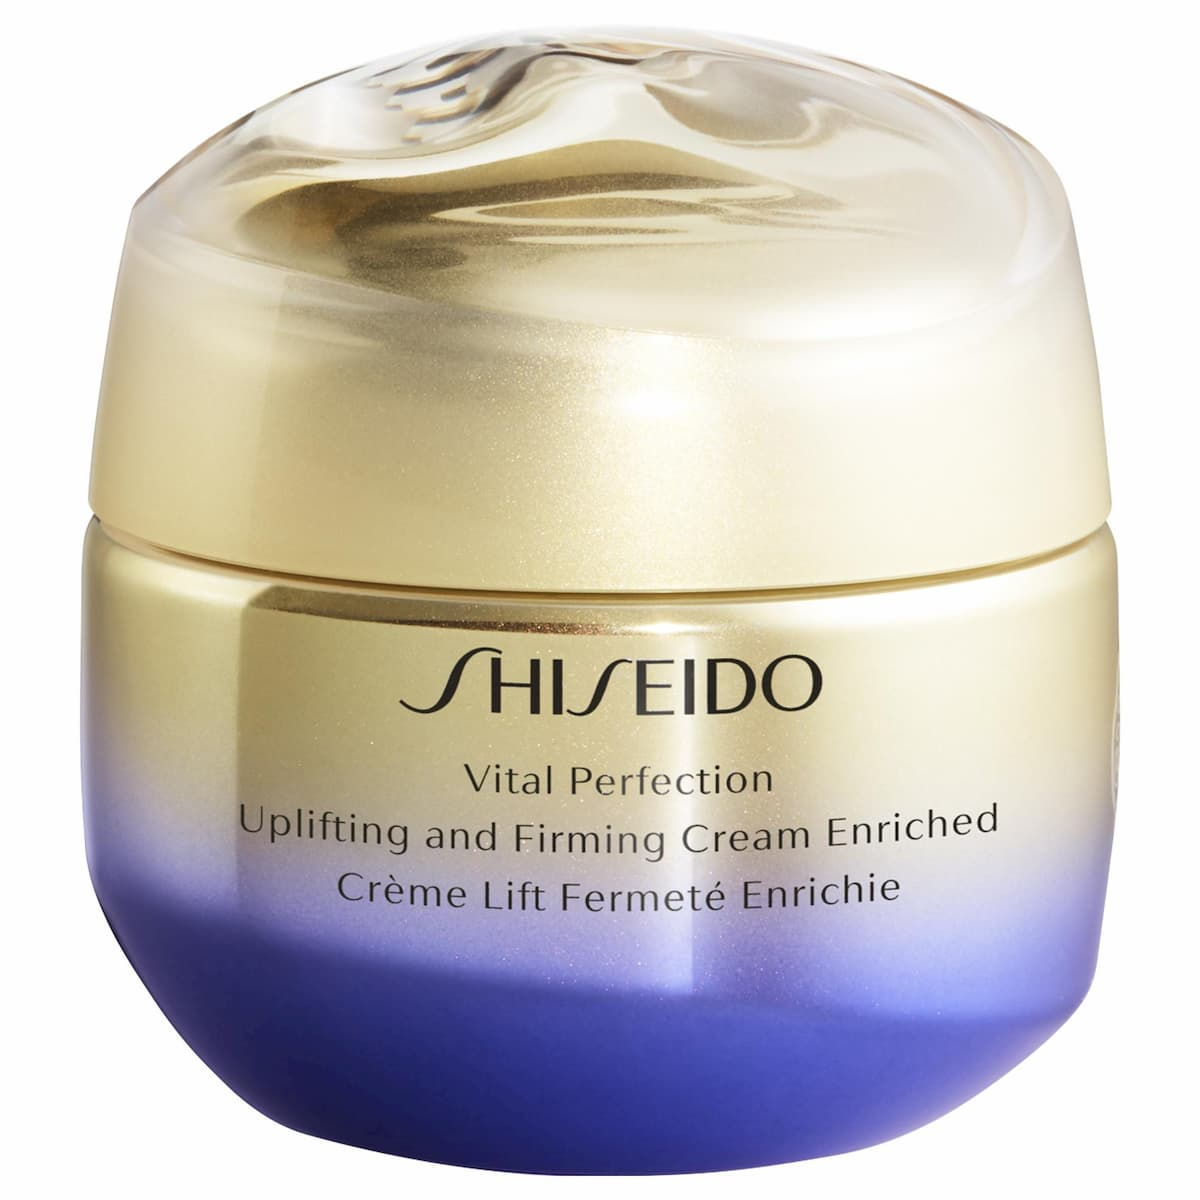 Shiseido - Vital Perfection - Crème Lift Fermeté Enrichie 50 ml